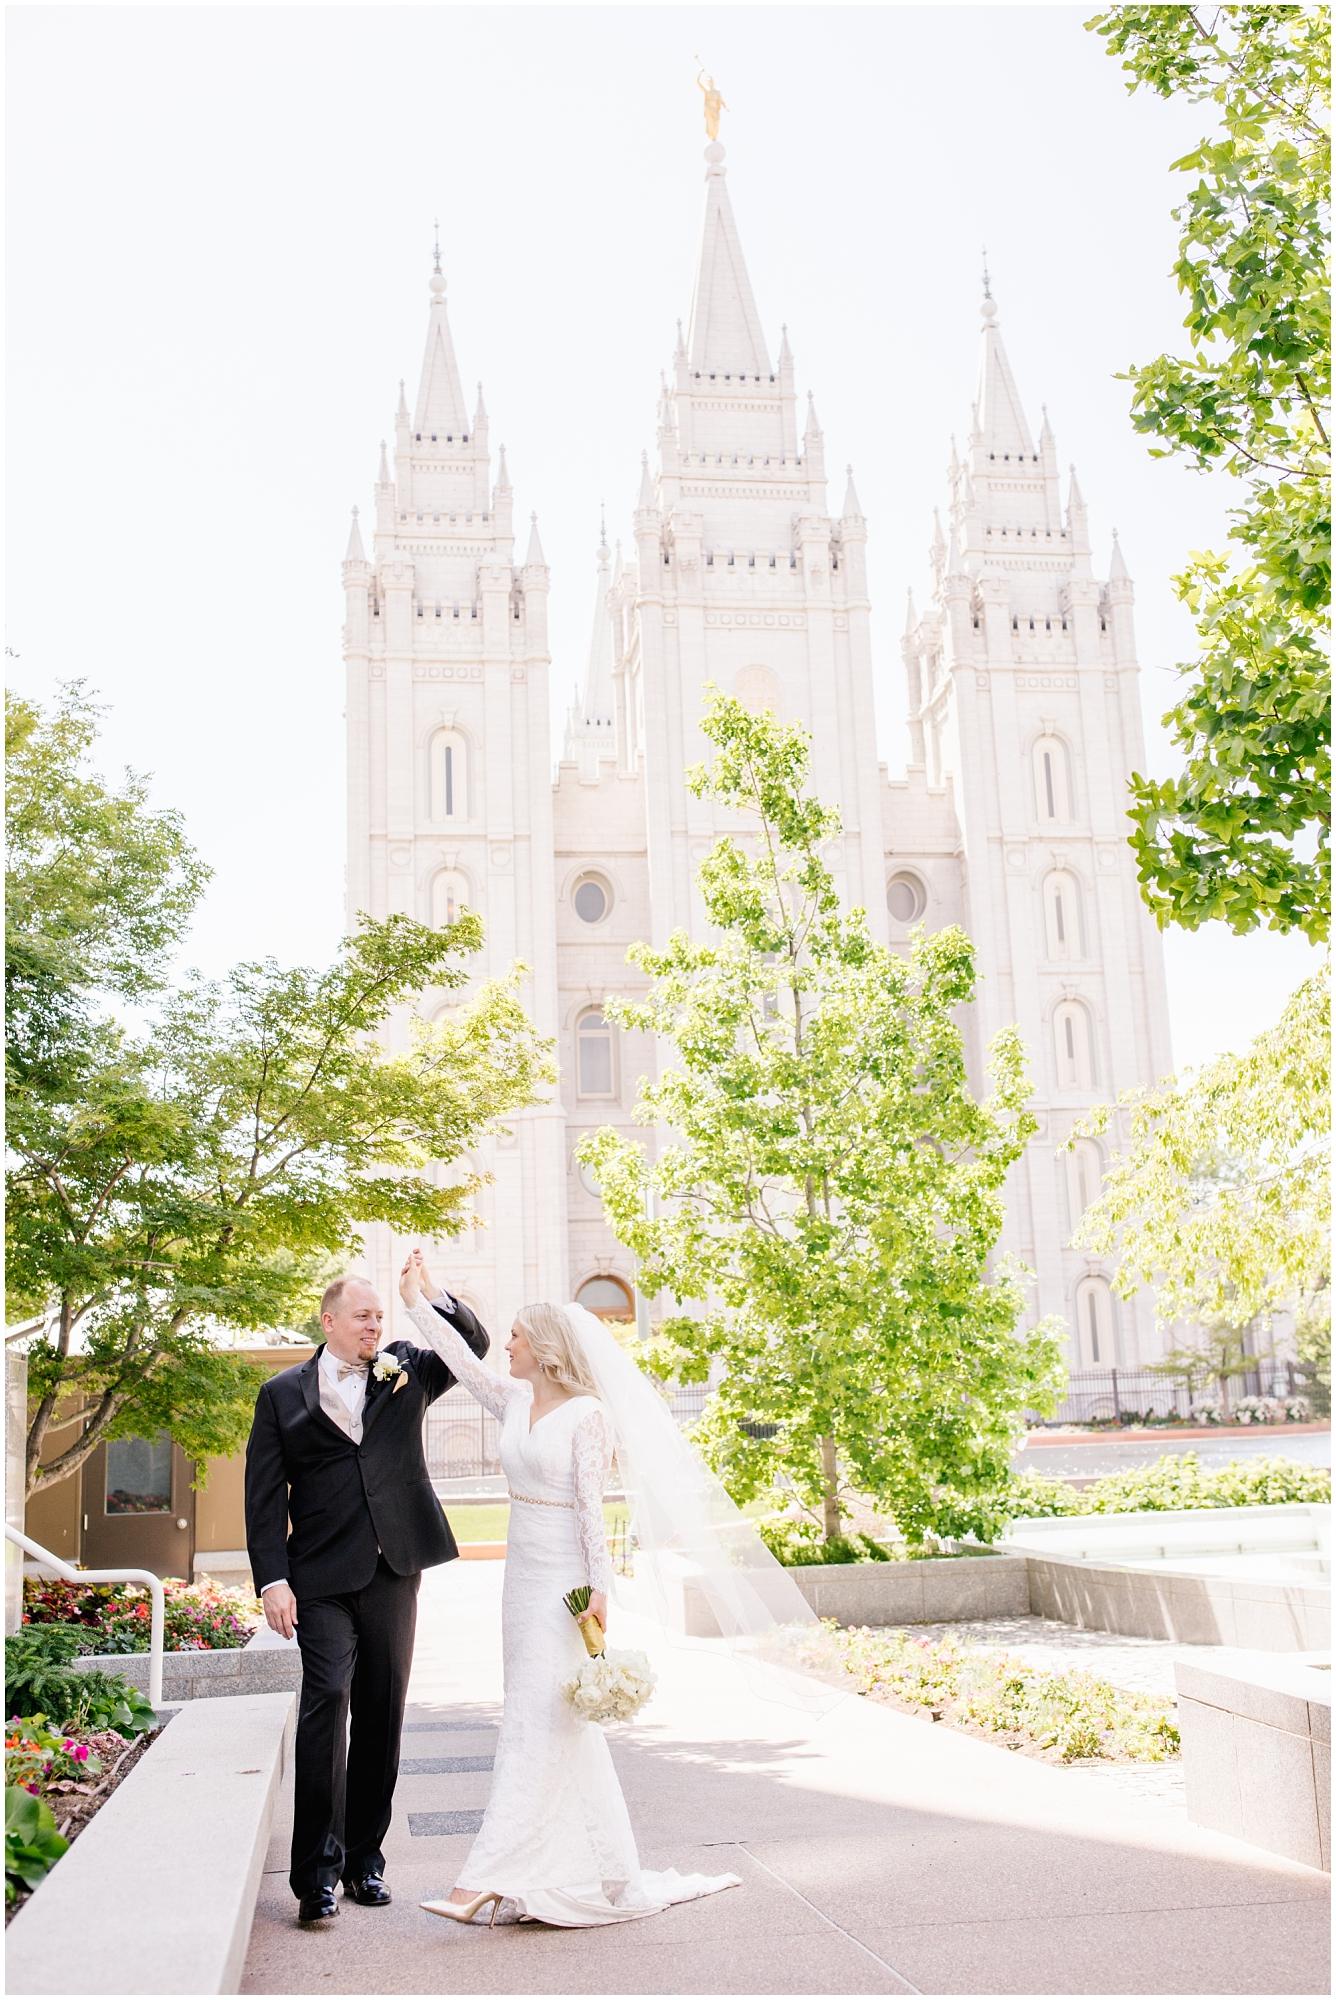 CherylandTyler-243_Lizzie-B-Imagery-Utah-Wedding-Photographer-Park-City-Salt-Lake-City-Temple-Wells-Fargo-Building.jpg